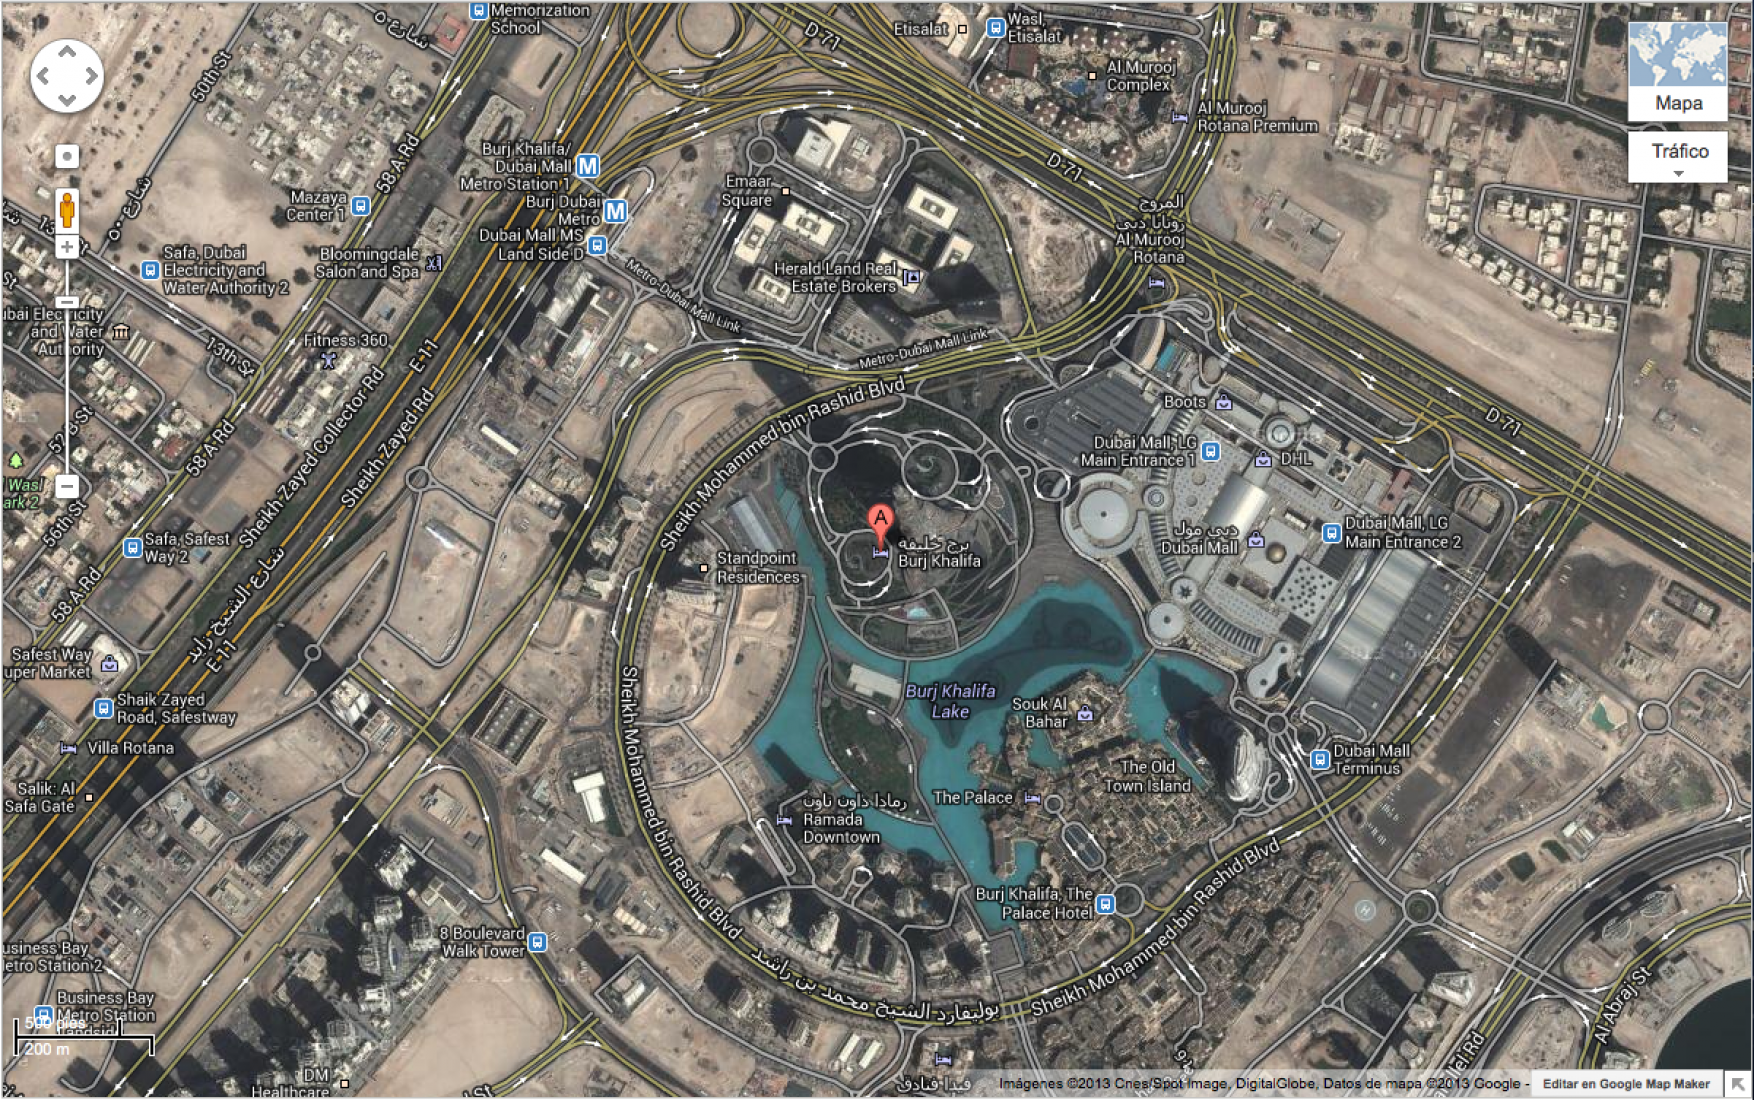 Burj Khalifa, video screenshot. Google Street View